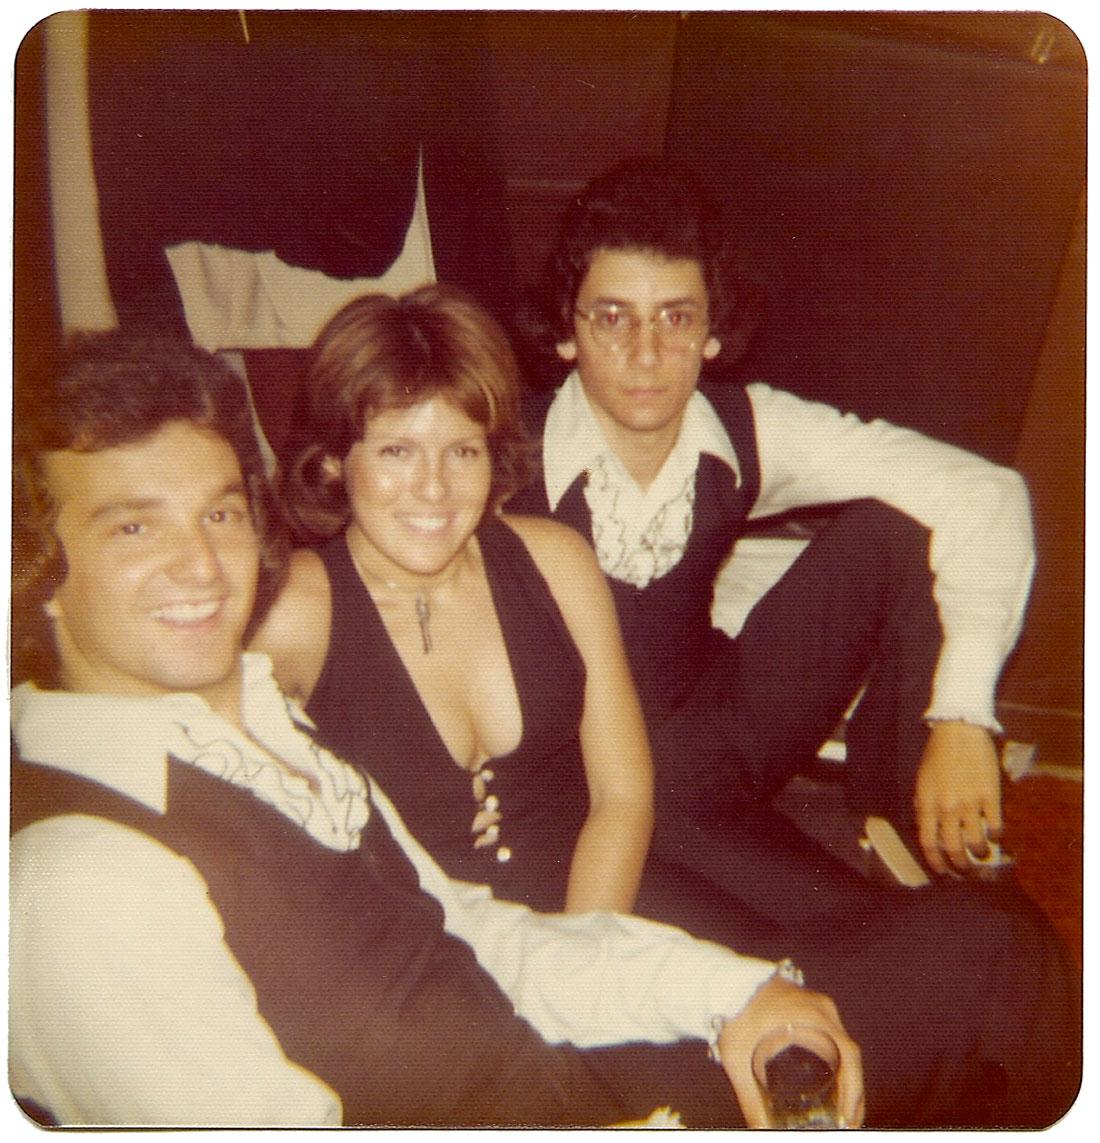 Frank Miret, Lina Arguelles and Carlos Segura backstage at Mr. Pip's.